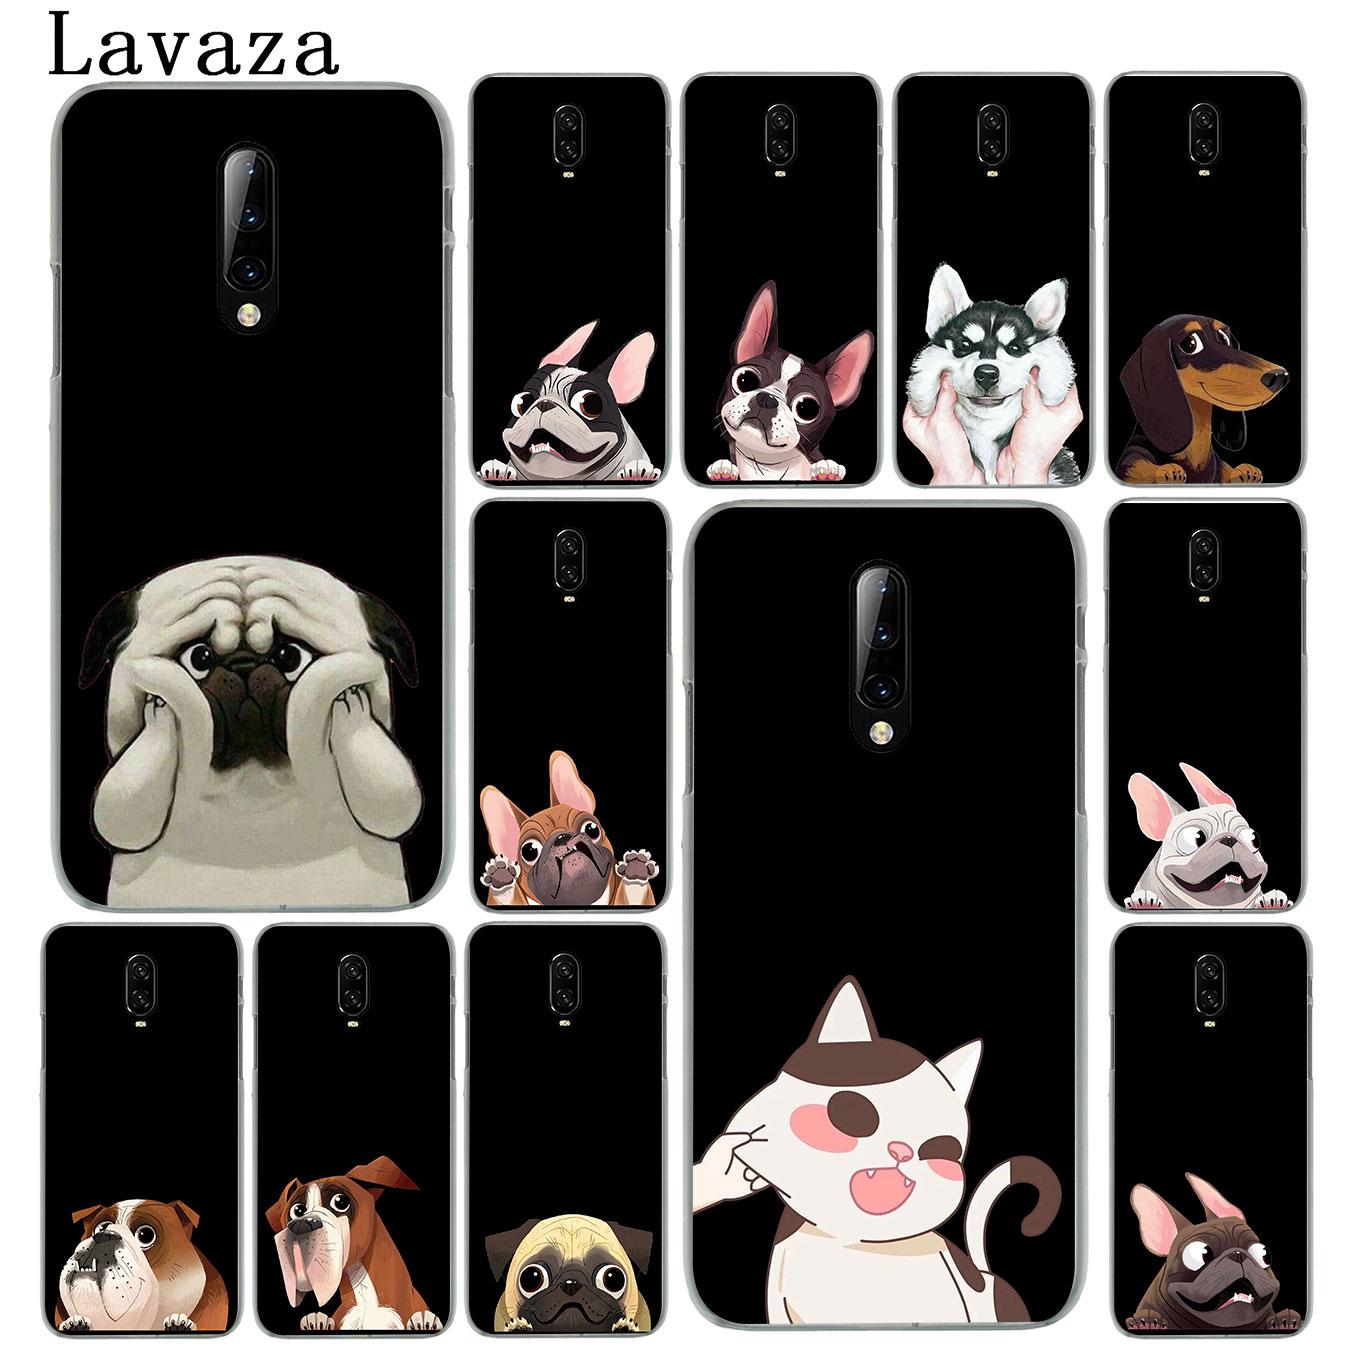 Cute Pug Dog divertido Bulldog corgi funda de plástico duro para teléfono móvil Oneplus 7T 7 Pro 6 6t 5 5T funda One Plus 7Pro